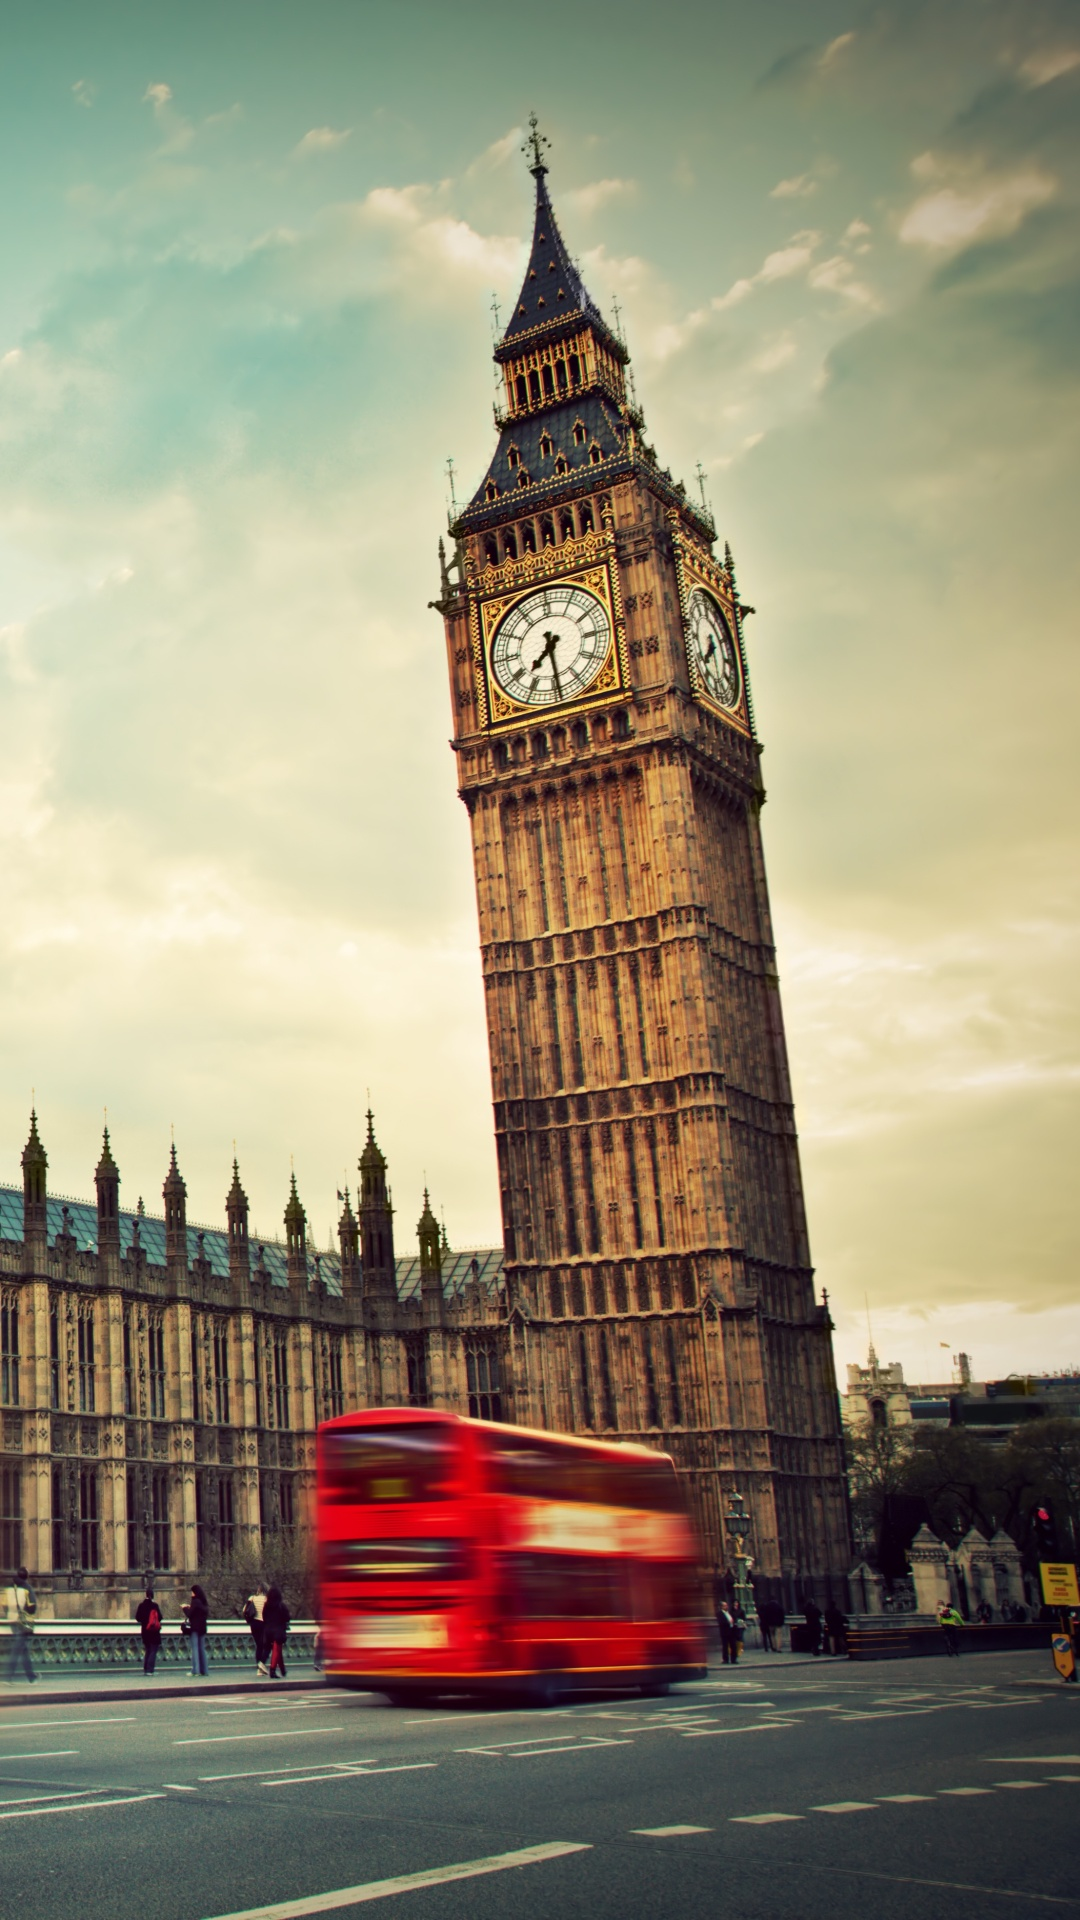 Big Ben Westminster Abbey Wallpapers 1080x1920 542155